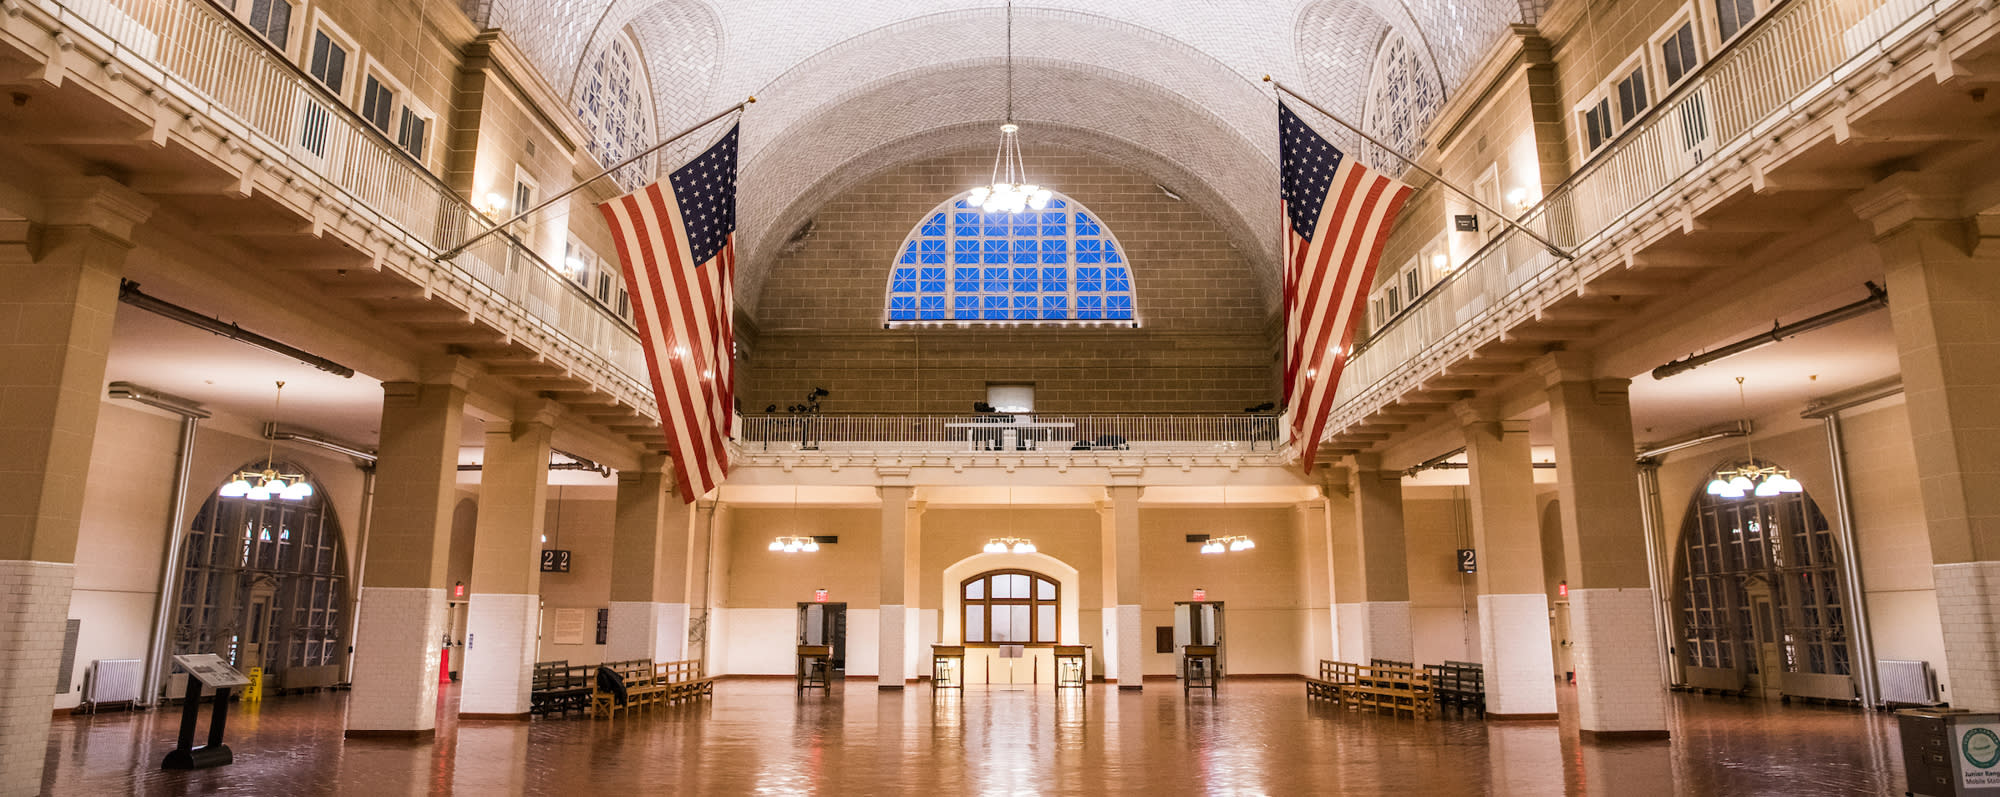 A photo of the interior of Ellis Island